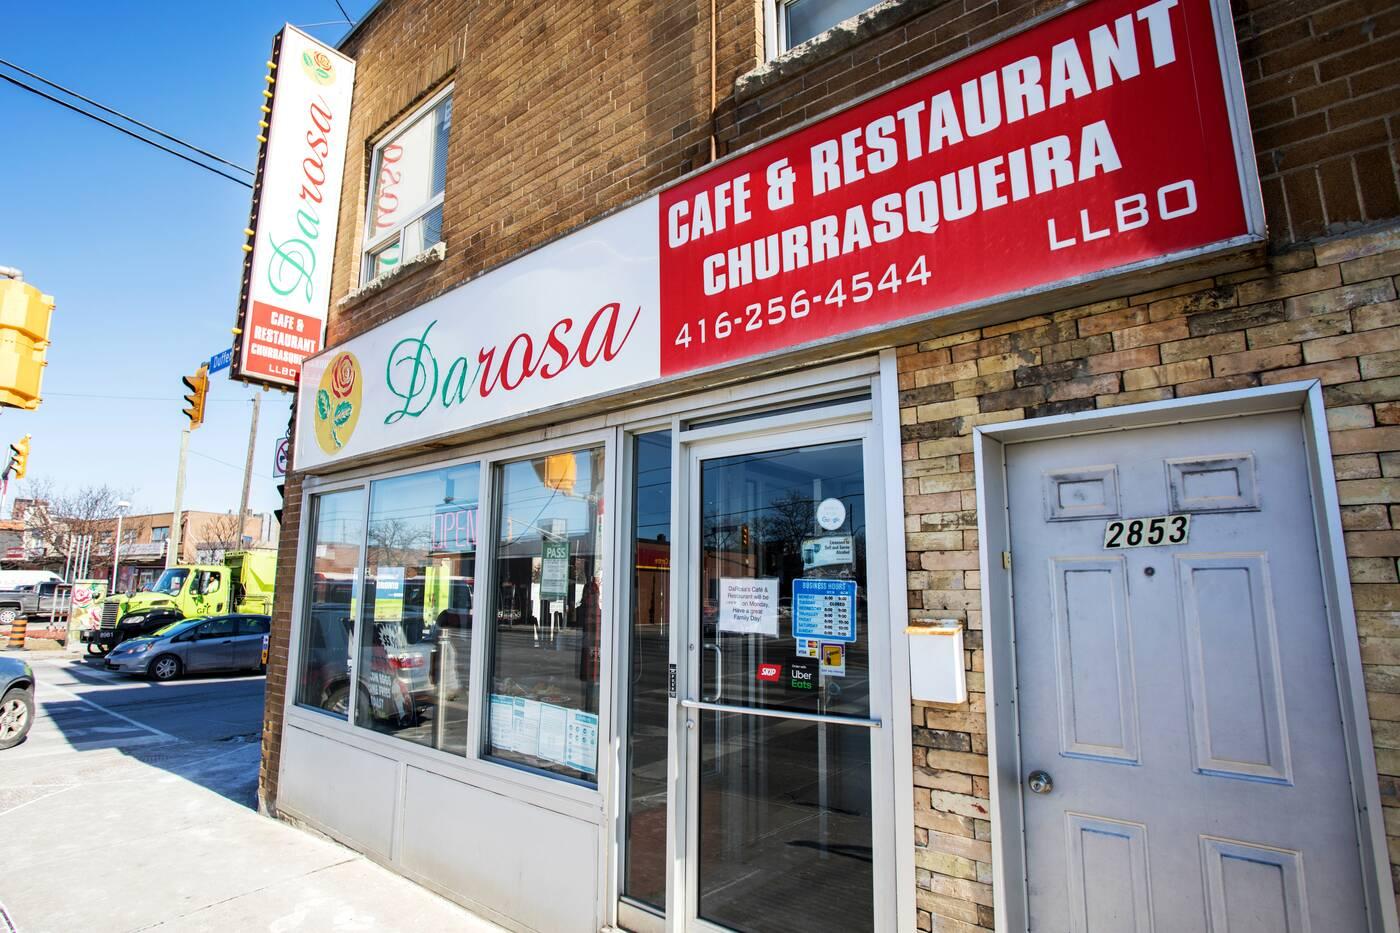 DaRosa Cafe Toronto